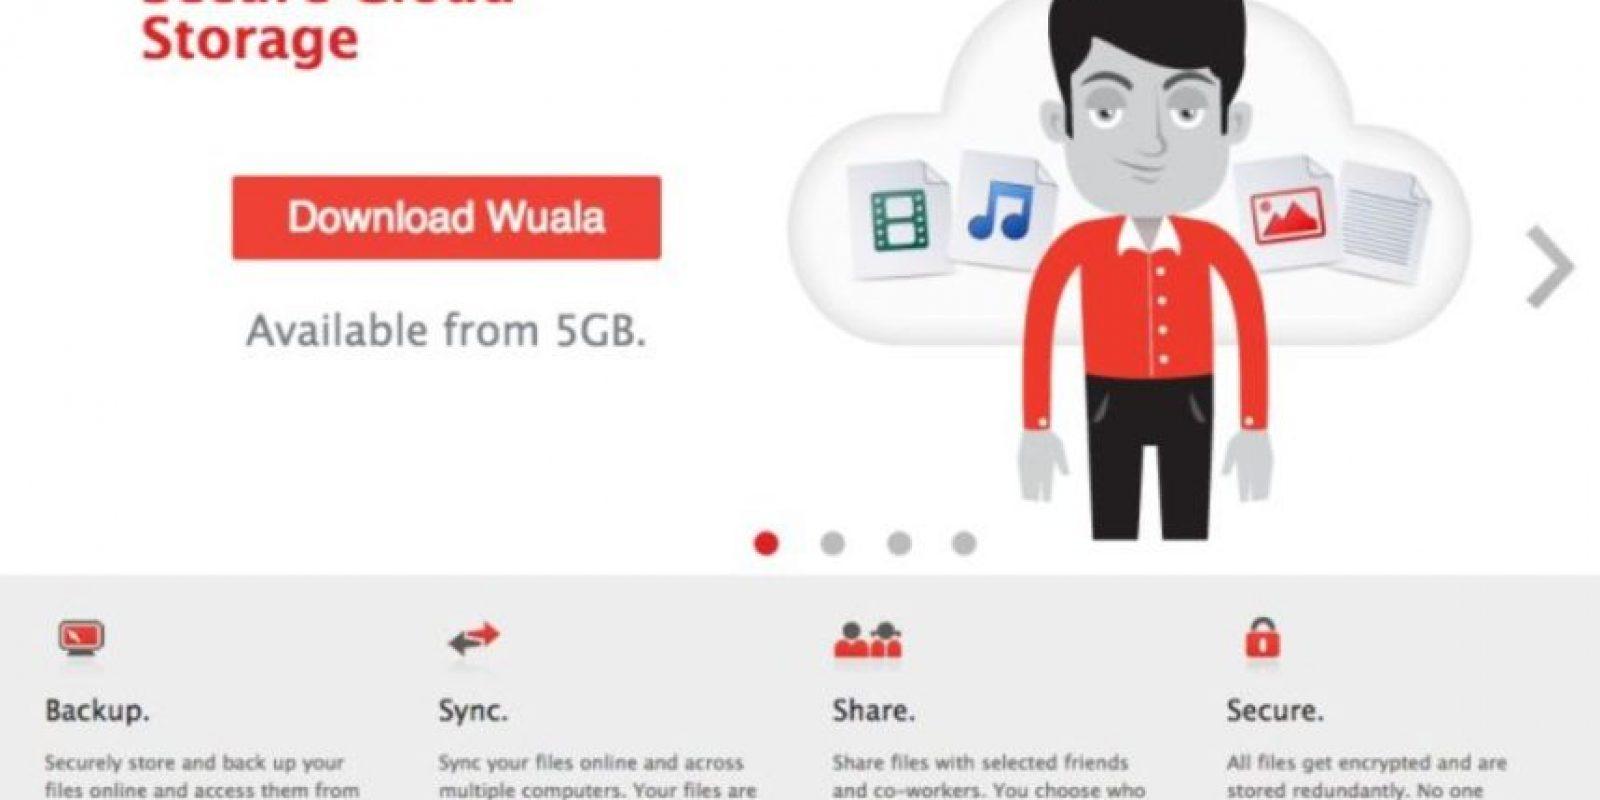 Wuala les permite hasta 5GB gratis. Foto:vía wuala.com